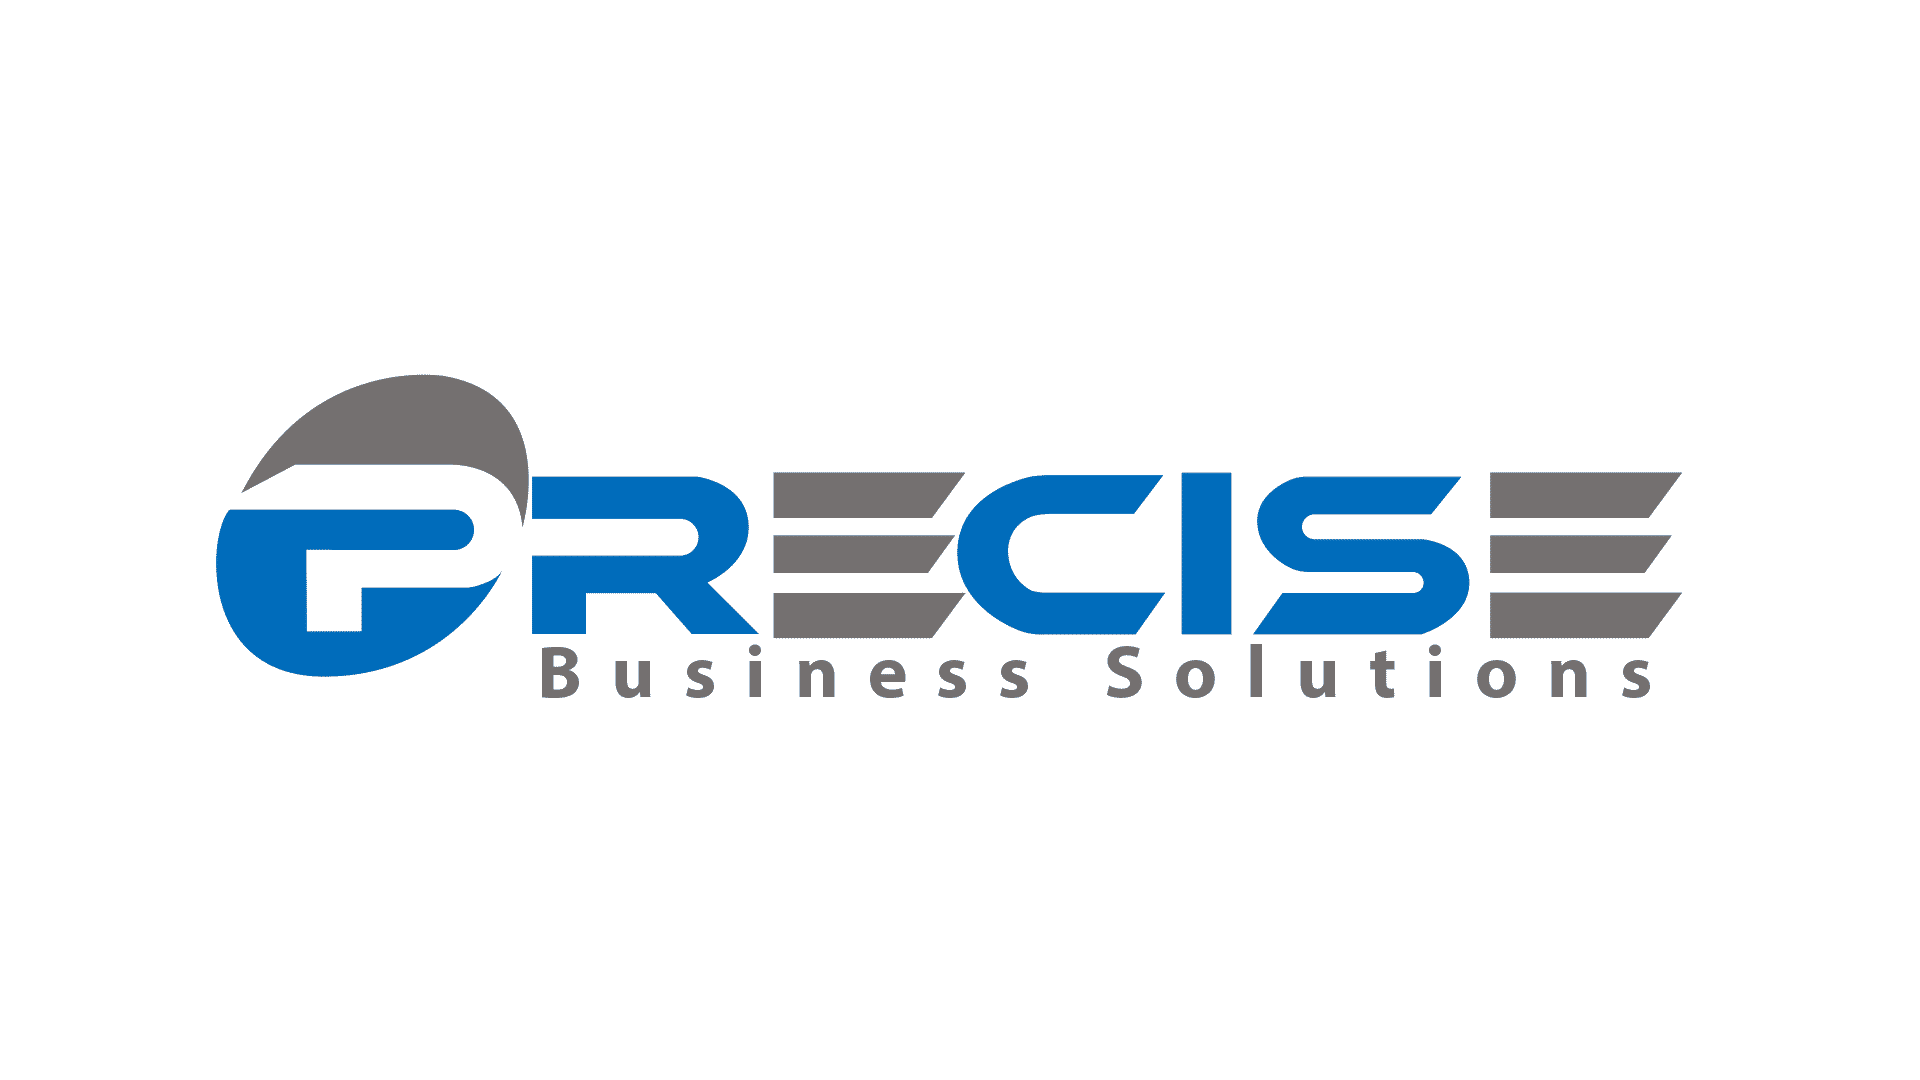 Managed IT Services, IT Services, Web Design, Website Design, Digital Marketing, VoIP, IT Consultation, IT Support